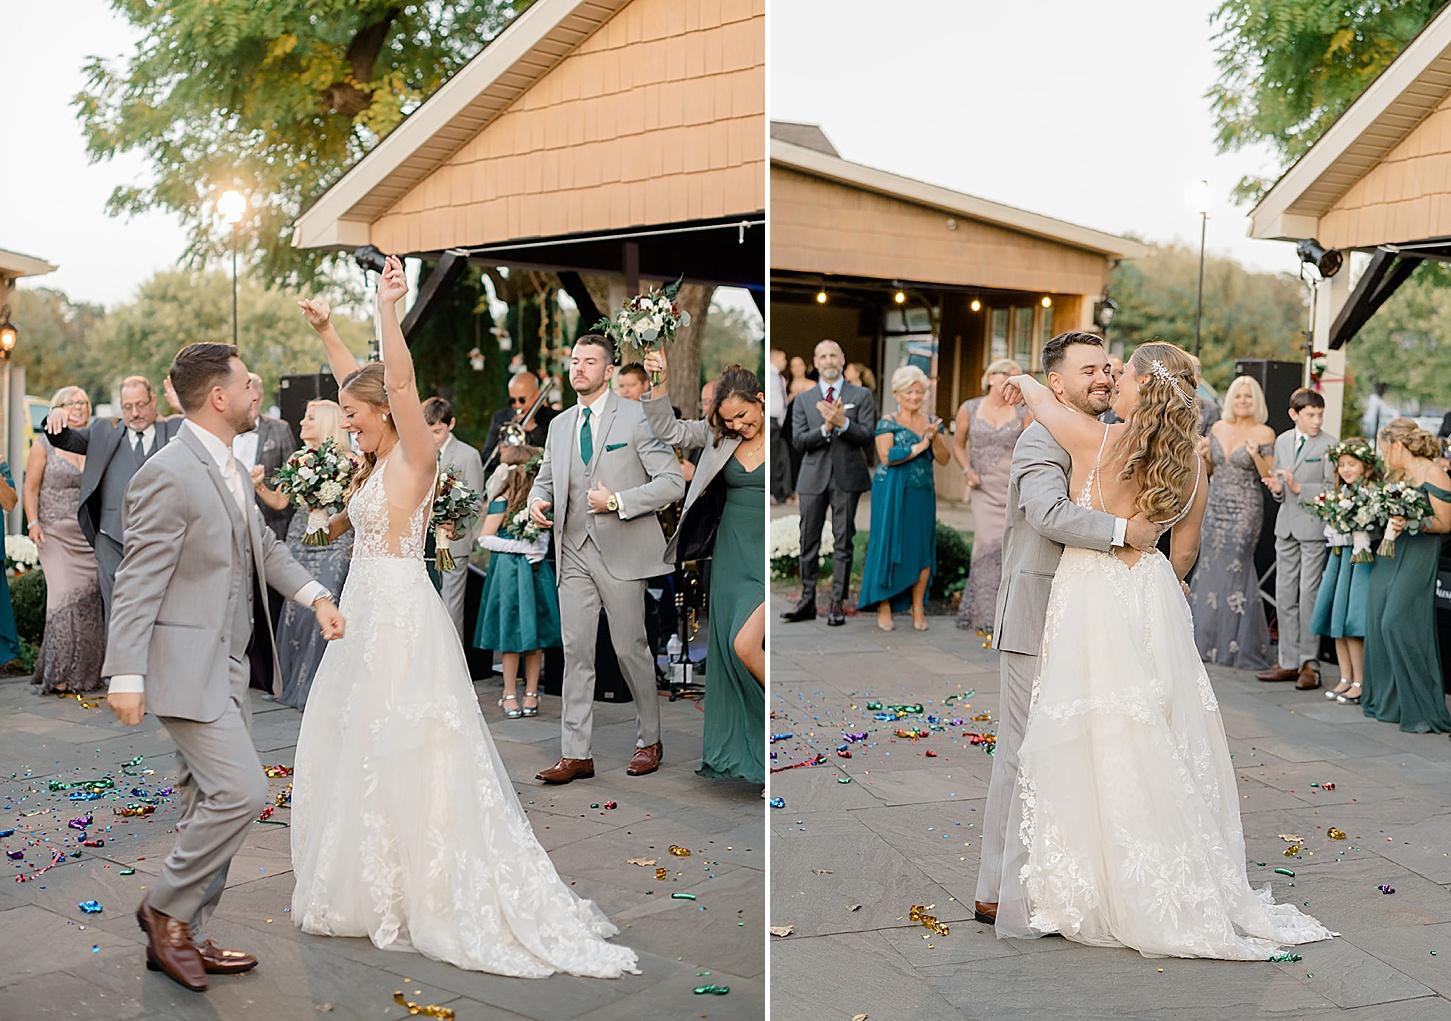 Valenzano Winery Vitners Pavillion Wedding Photography by Magdalena Studios 0041